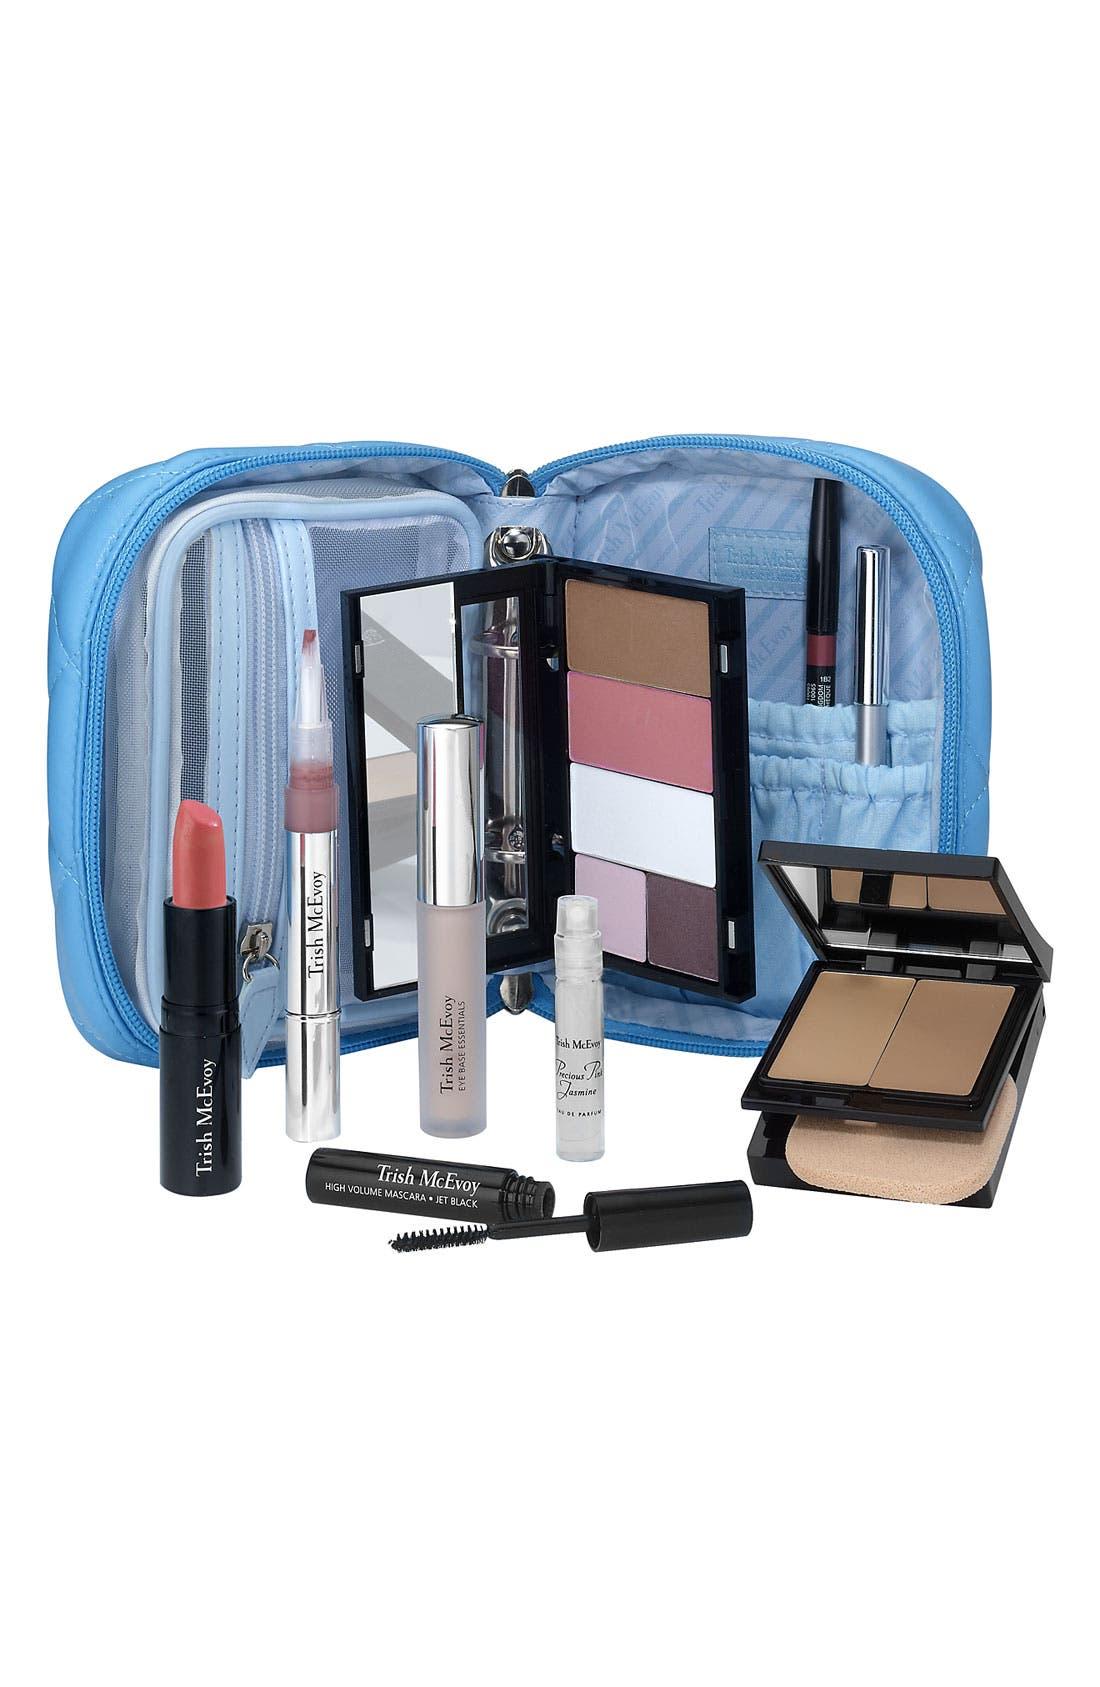 Alternate Image 1 Selected - Trish McEvoy 'Effortless Beauty - Flirt' Makeup Planner